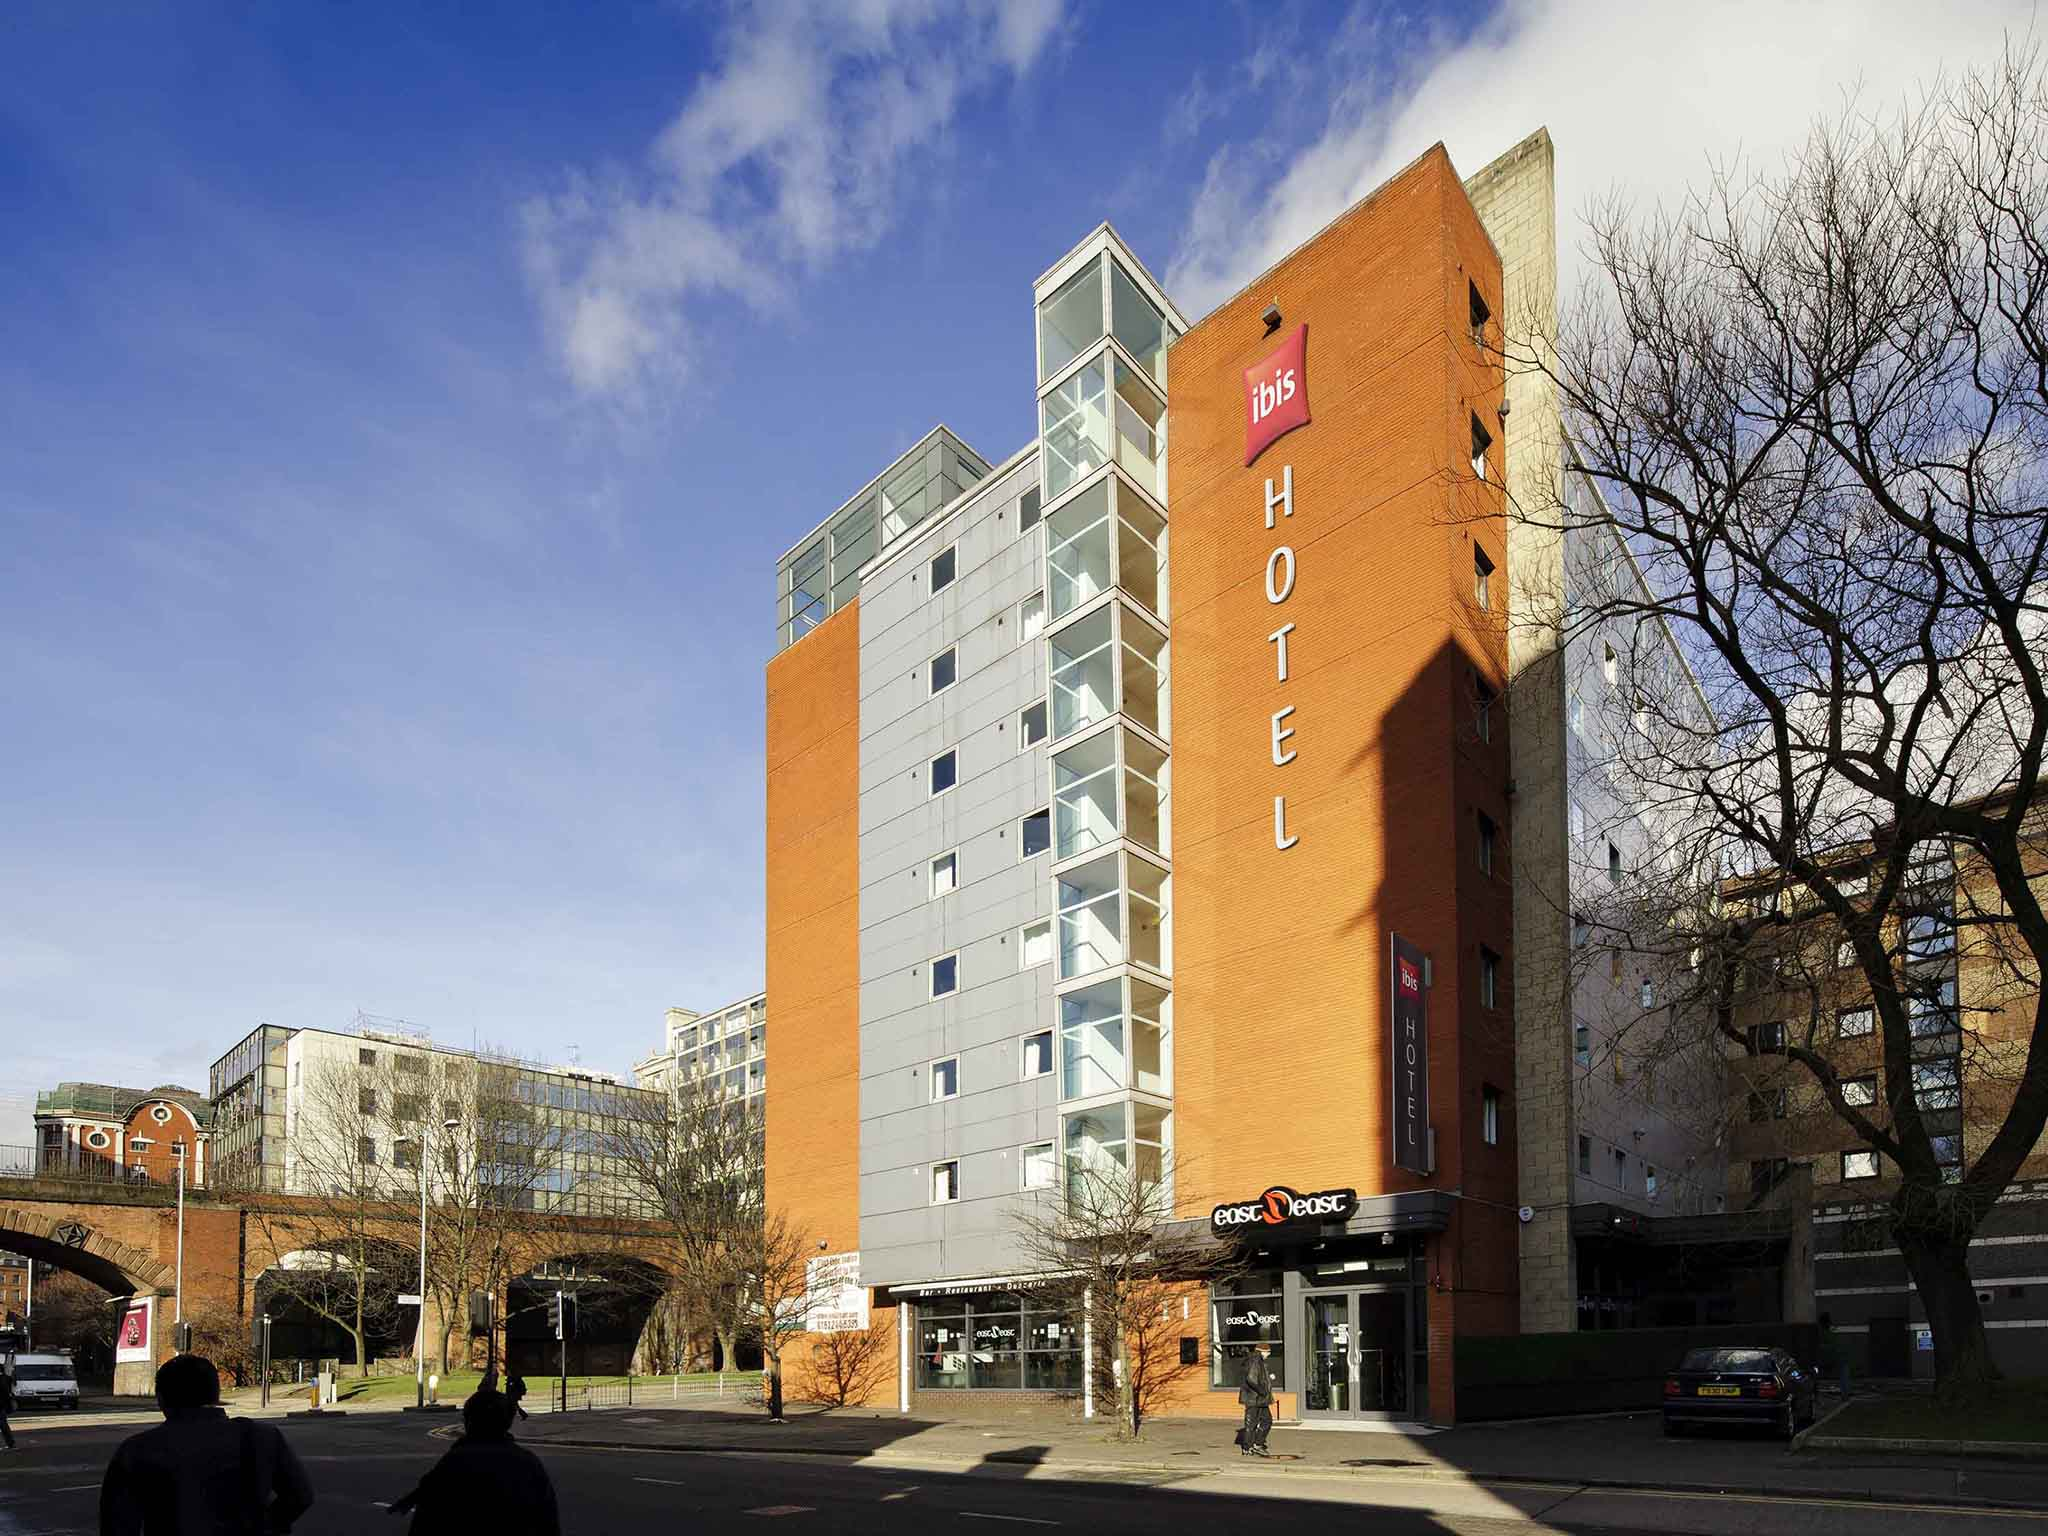 Hotell – Ibis Manchester Centre Princess Street (nya ibis-rum)